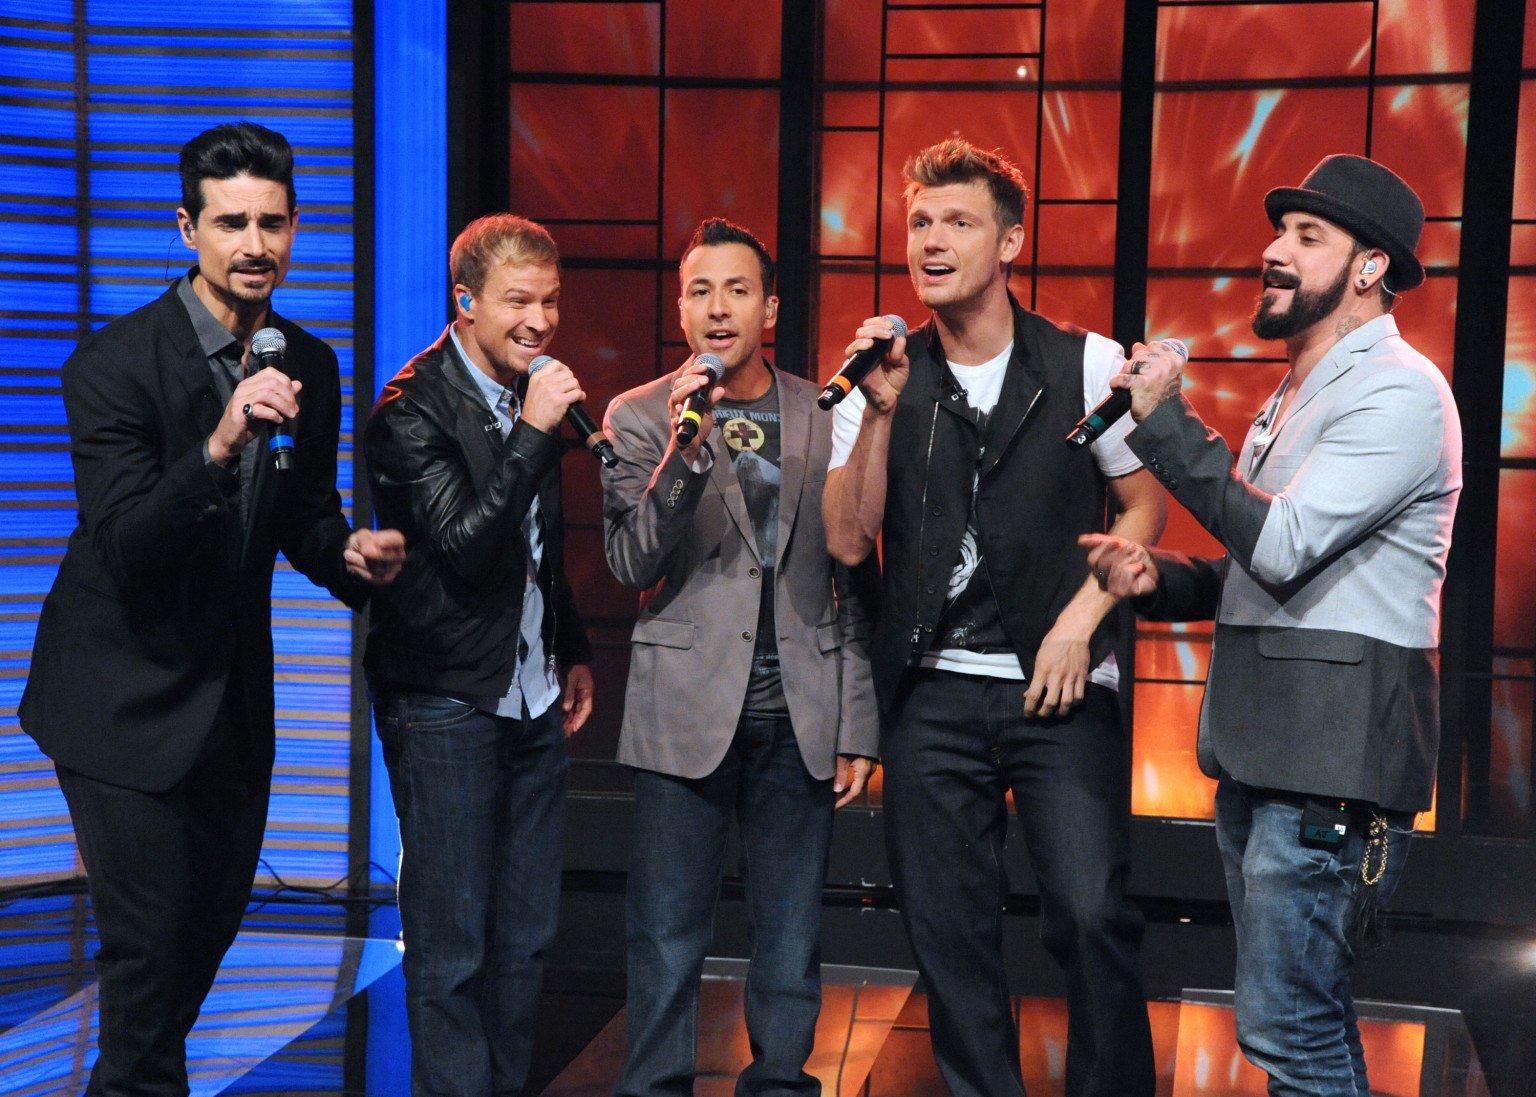 Halsey Presale Passwords: Backstreet Boys Presale Passwords